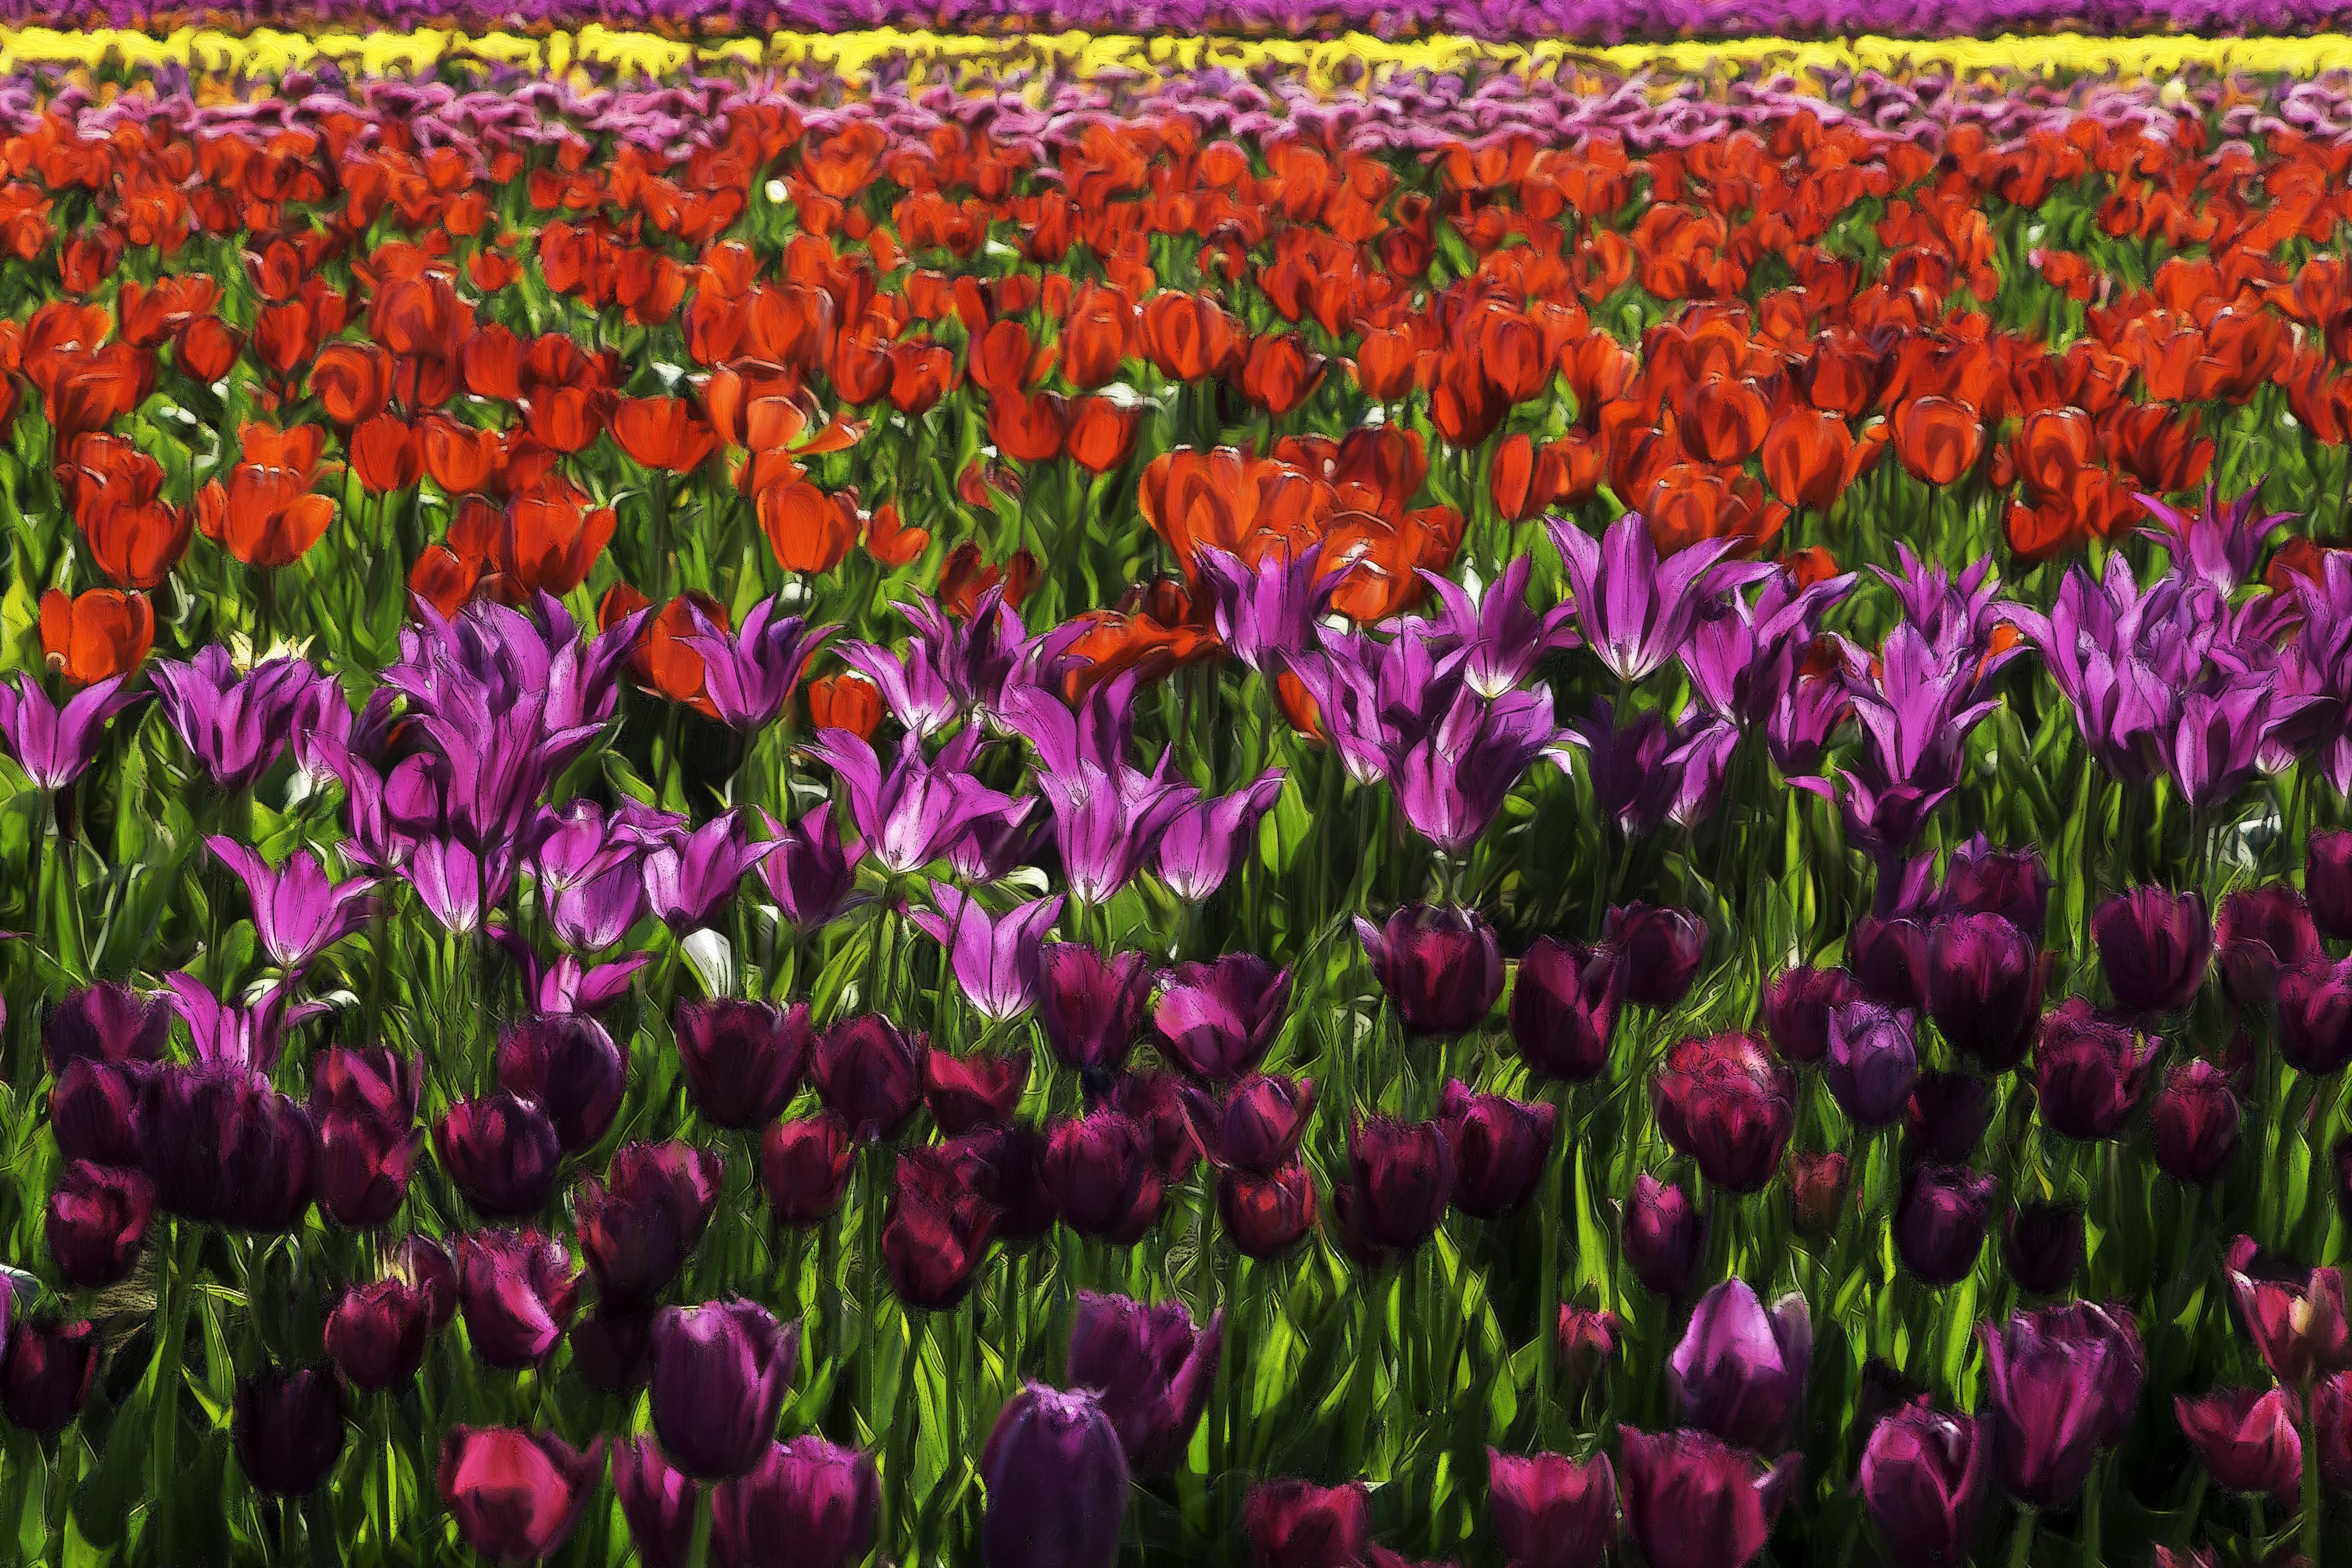 Free Images : field, flower, petal, tulip, colorful, flowers ...